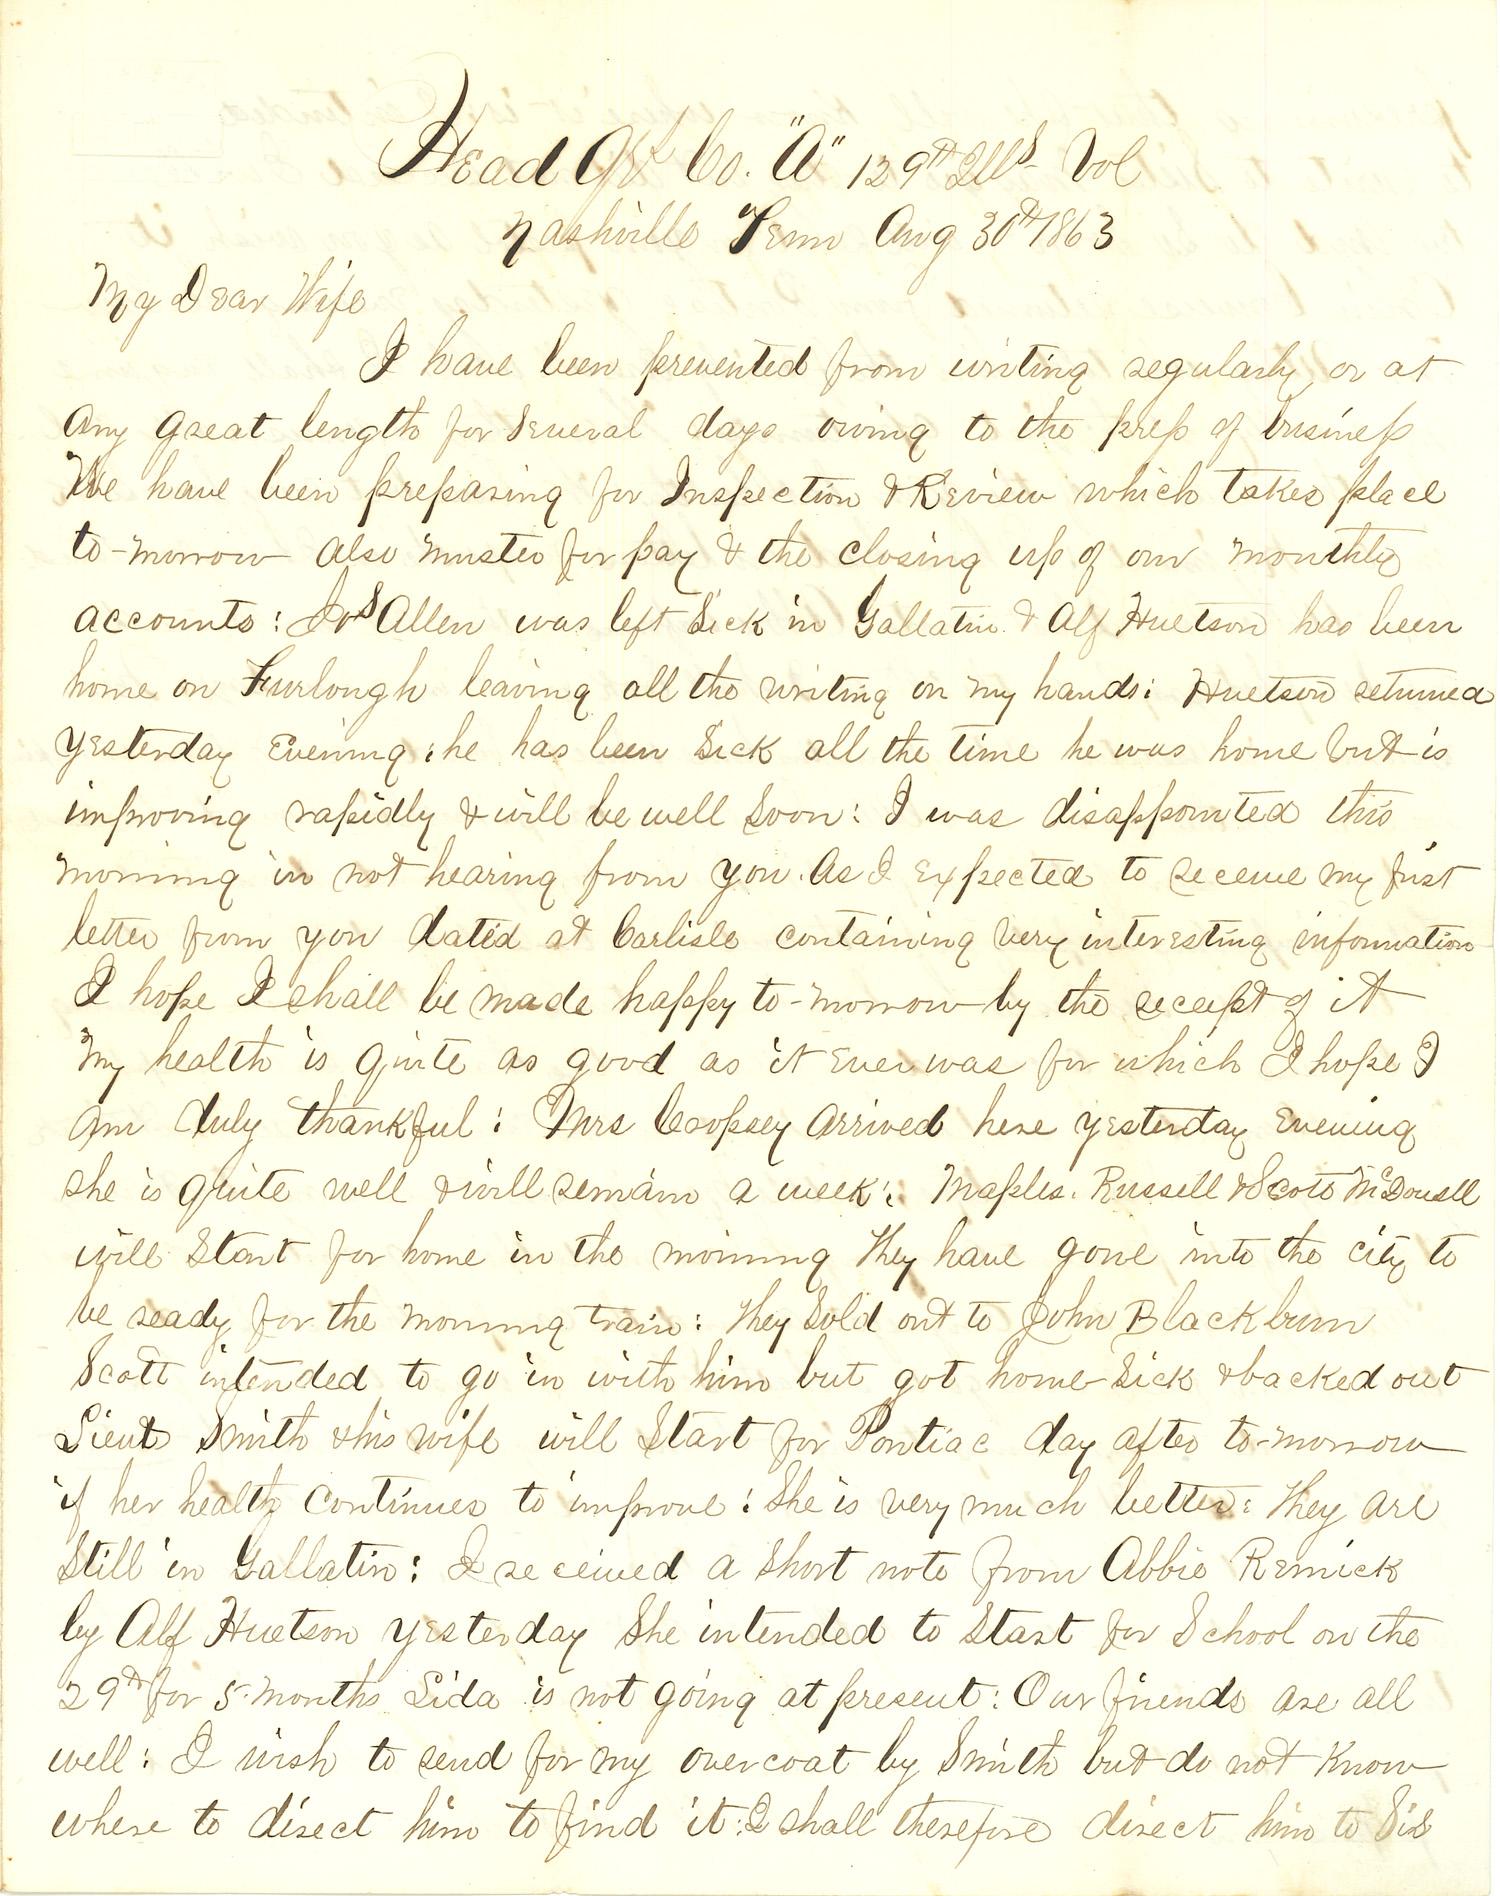 Joseph Culver Letter, August 30, 1863, Page 1